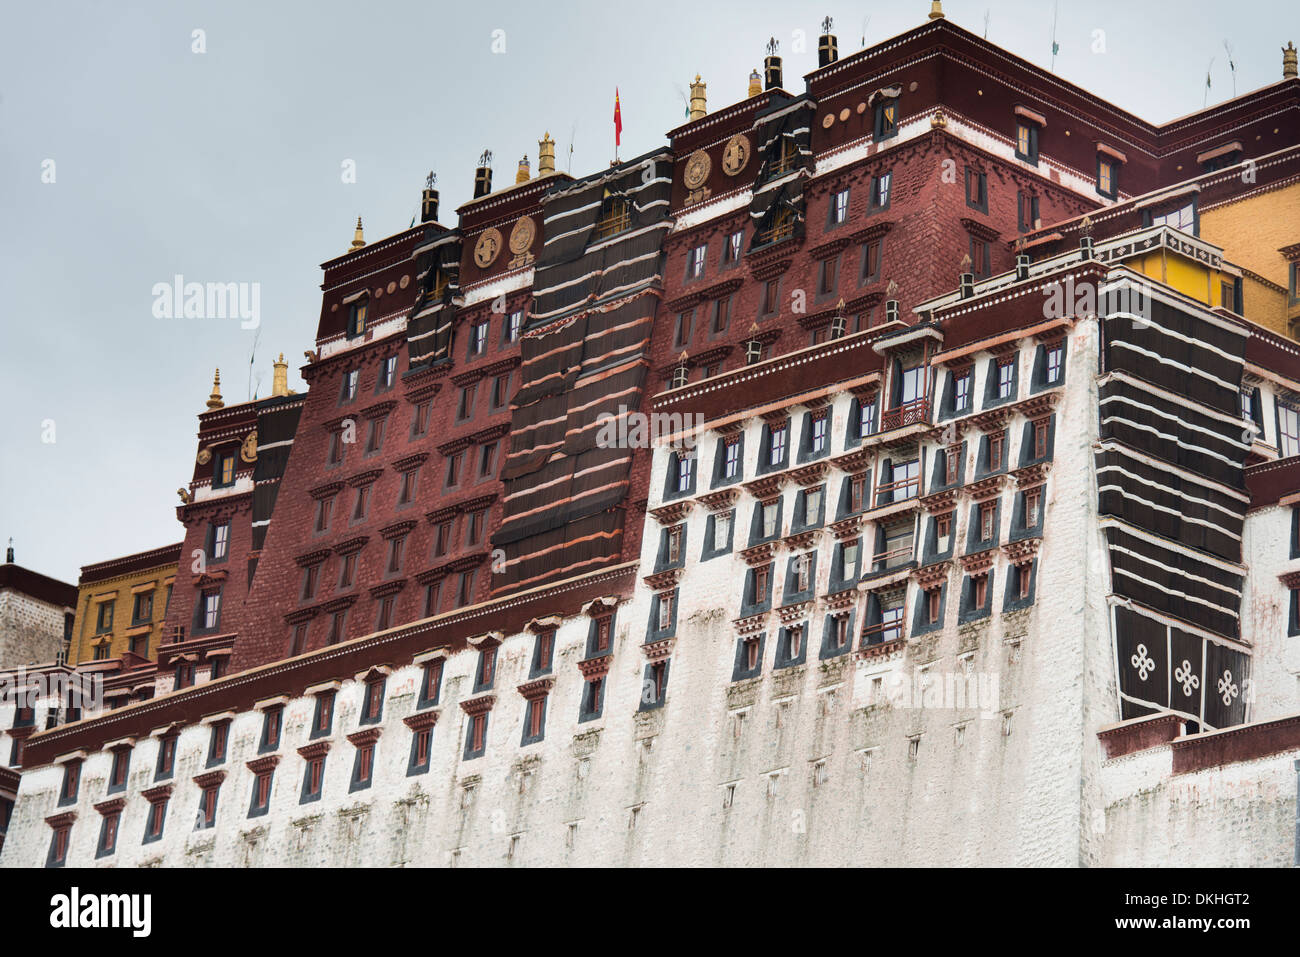 Low angle view of the Potala Palace, Lhasa, Tibet, China - Stock Image